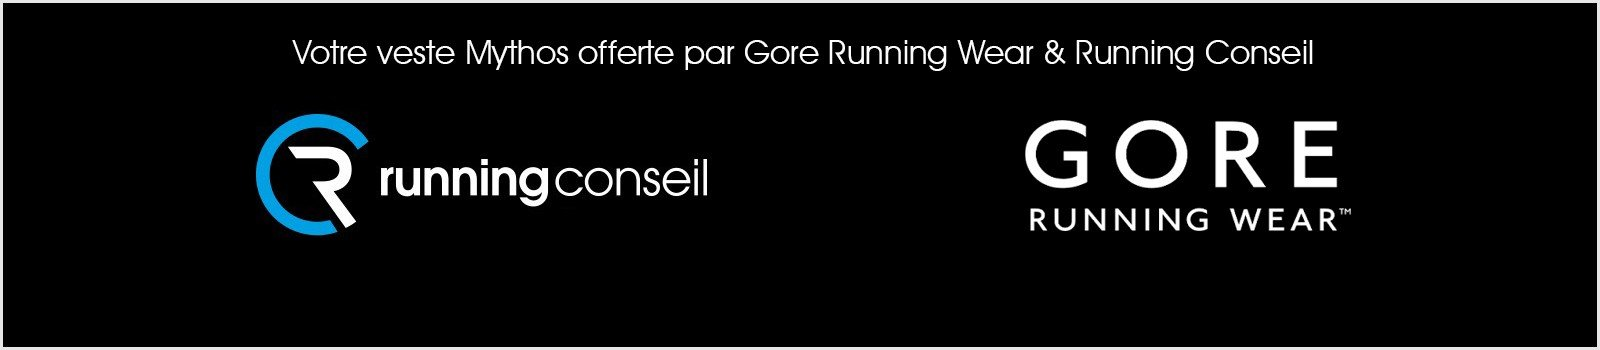 Votre veste Mythos offerte par Gore Running Wear & Running Conseil